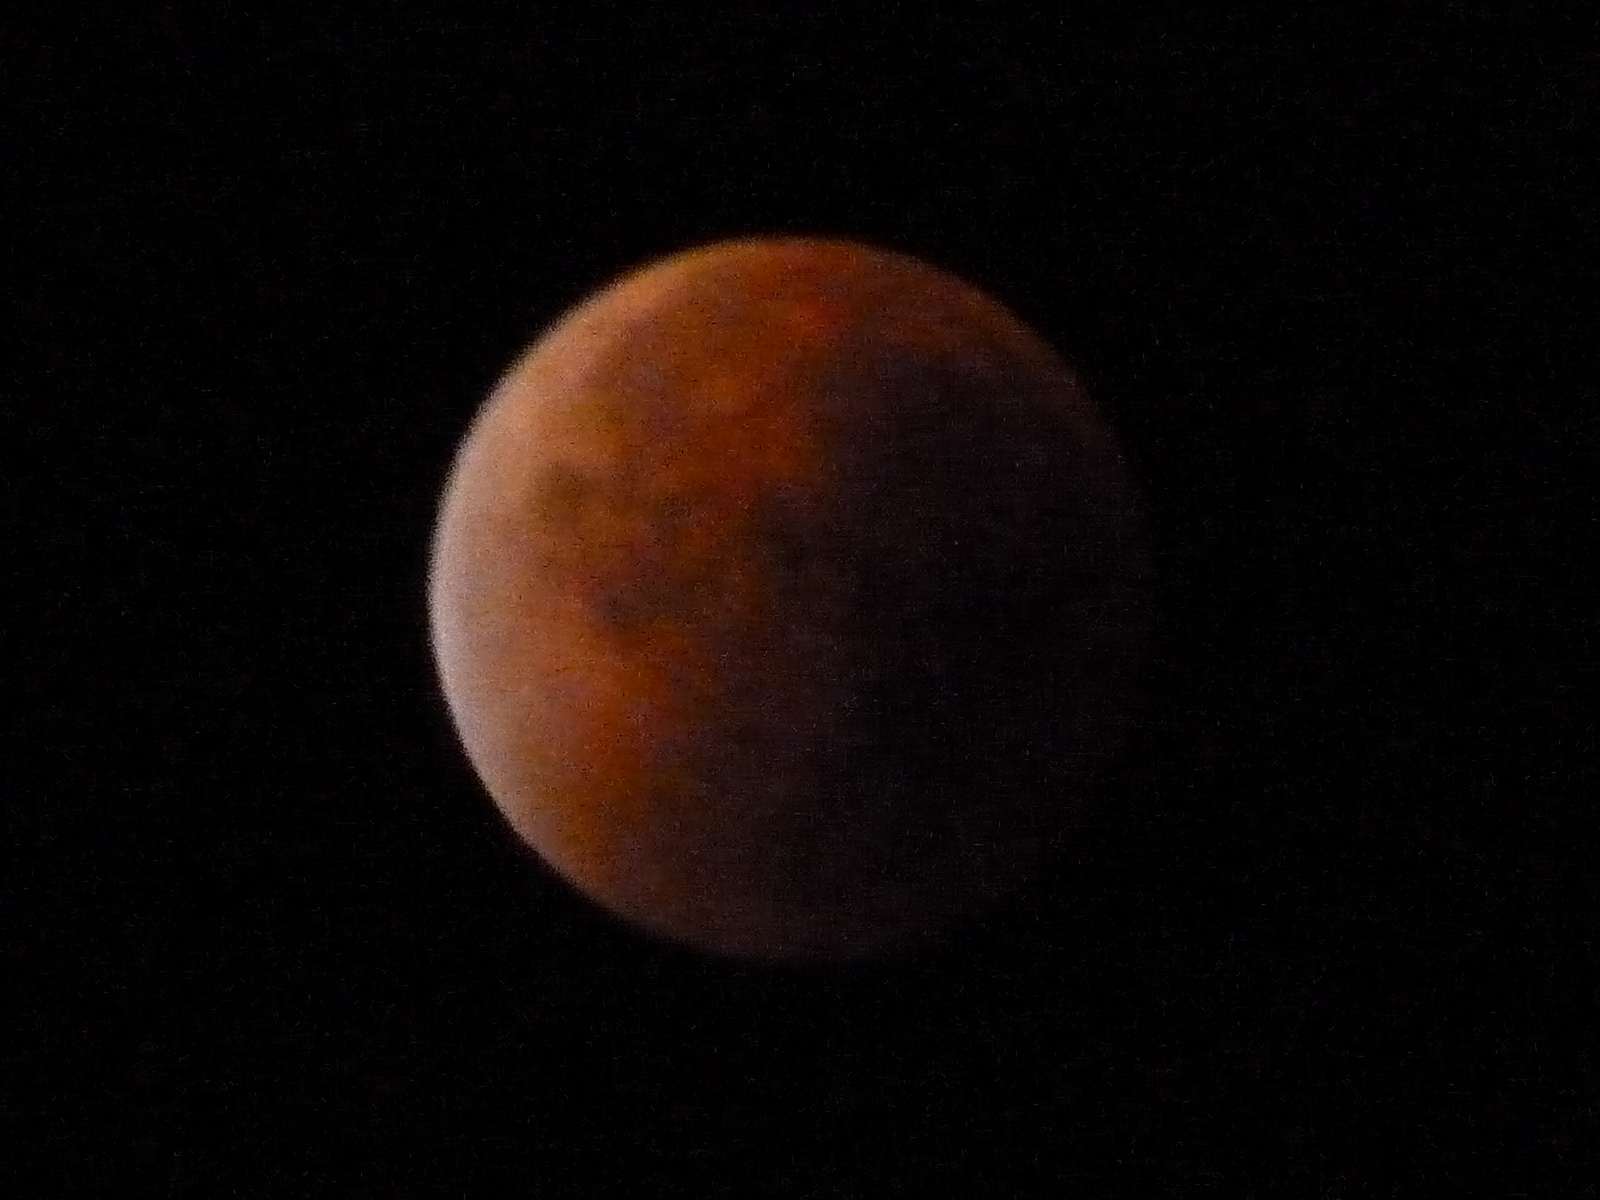 Totale Mondfinsternis vom 28.9.2015